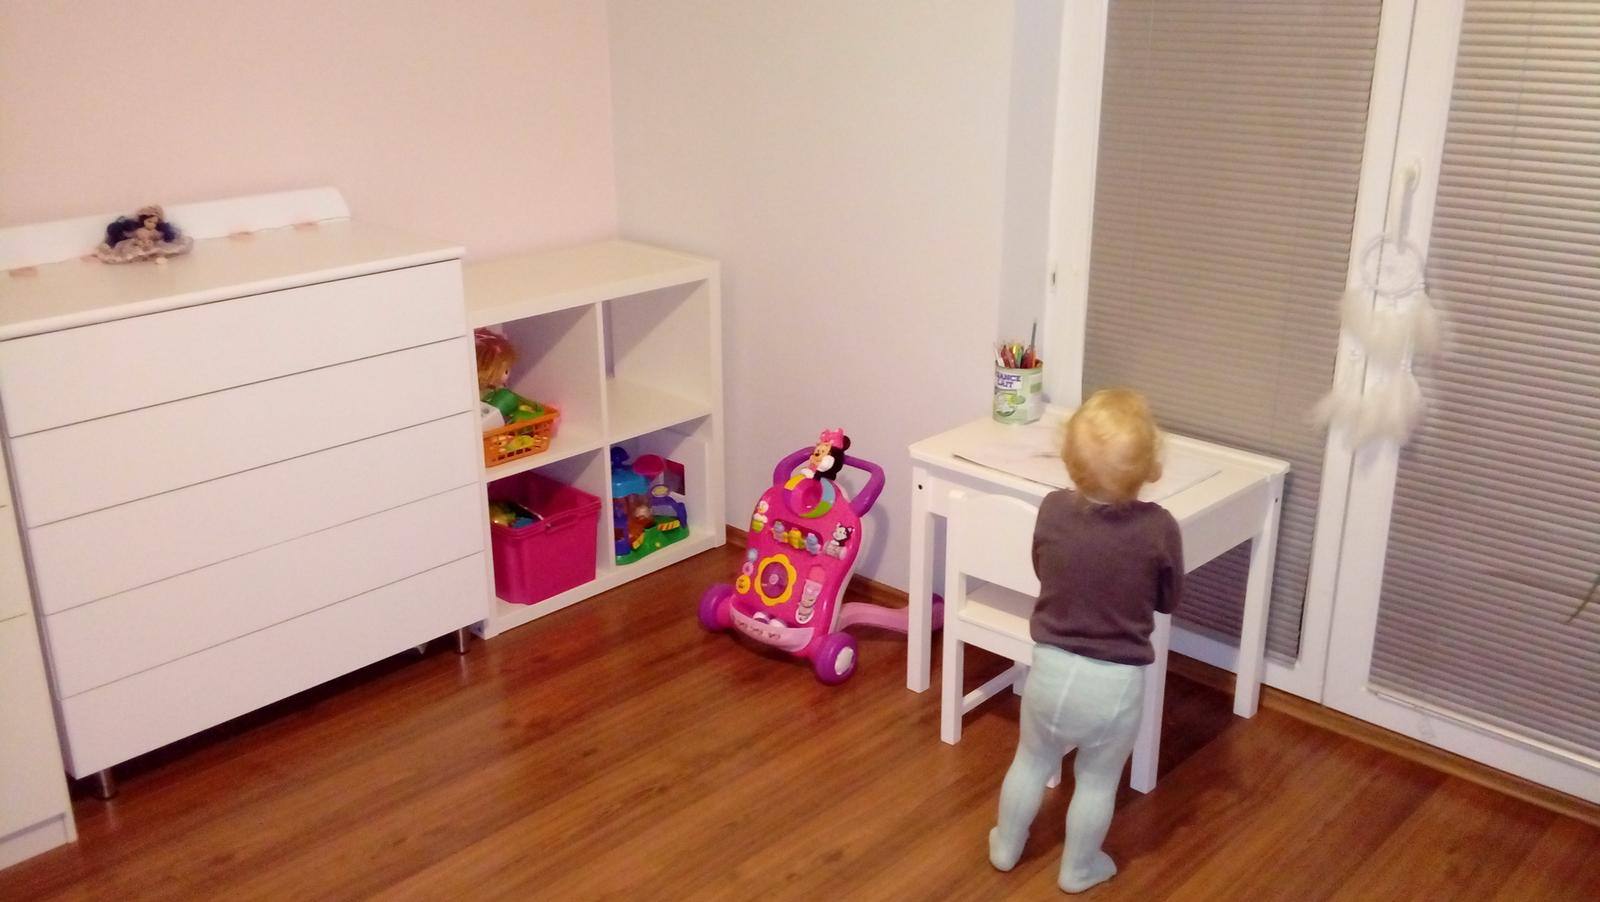 Projekt hostovska  nakoniec detska :-D - mala je spokojna